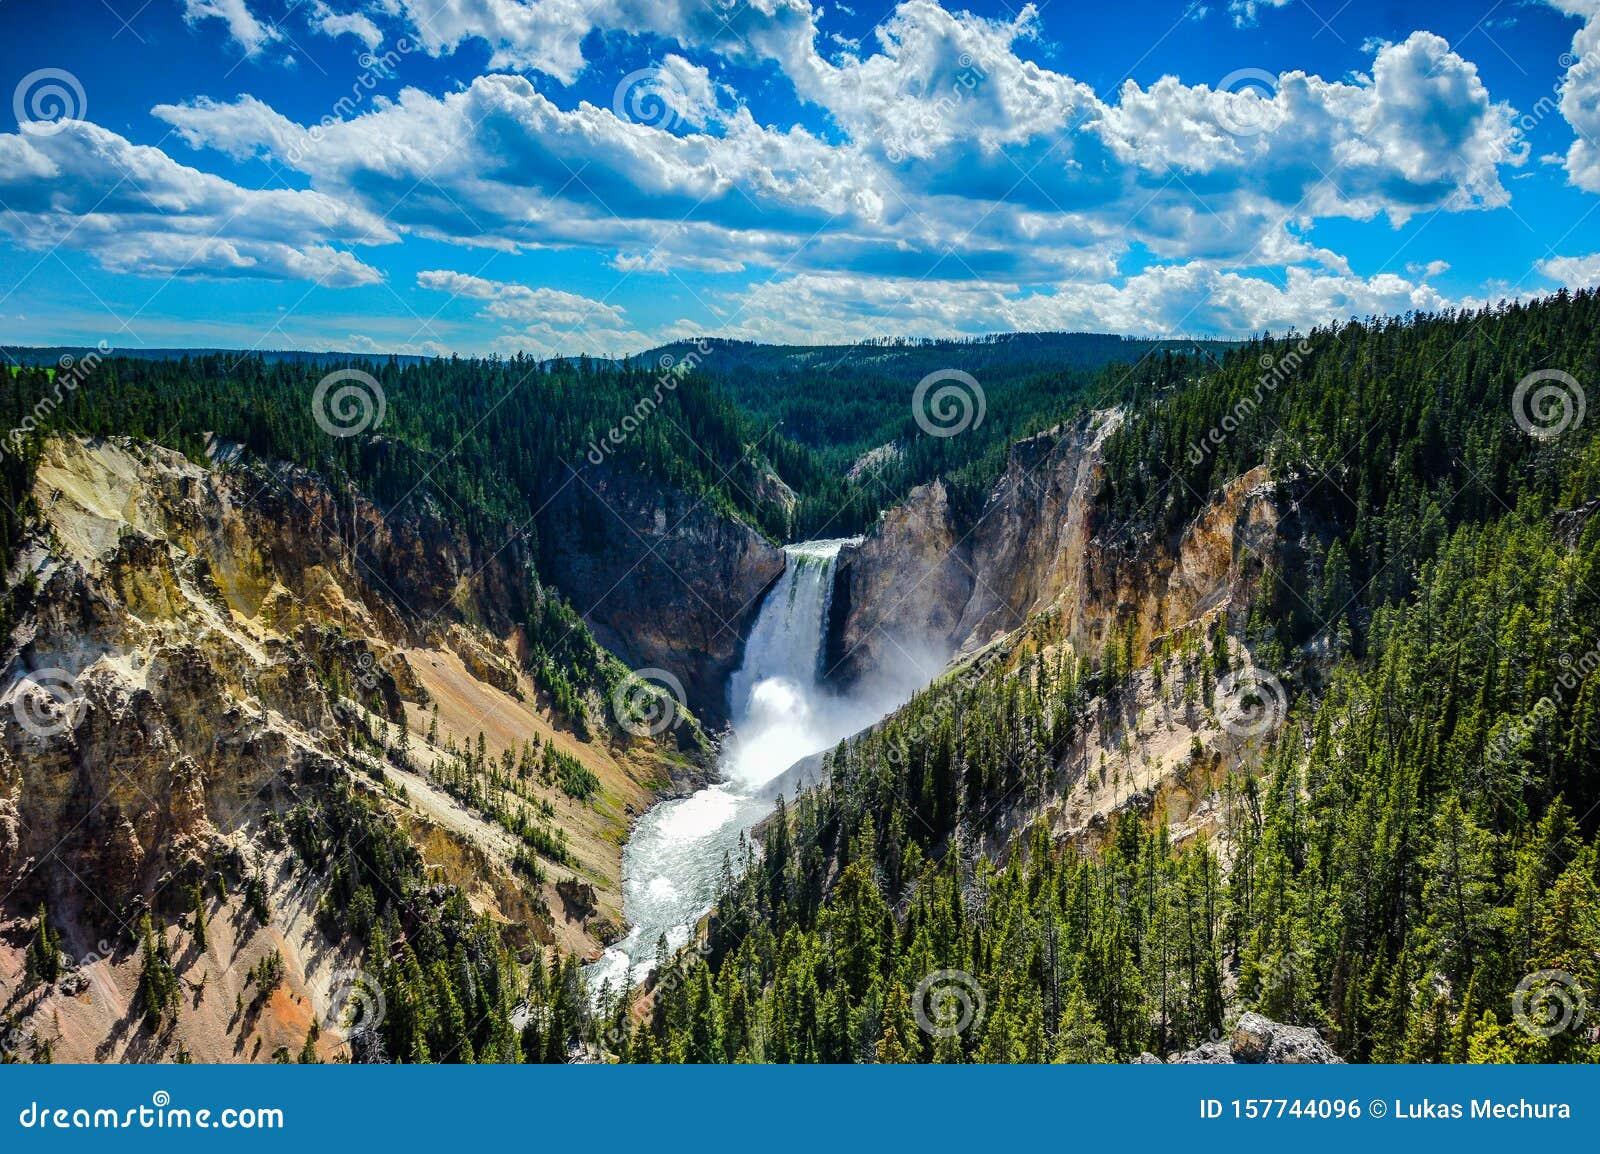 Yellowstone Lower Falls - Waterfall in Yellowstone